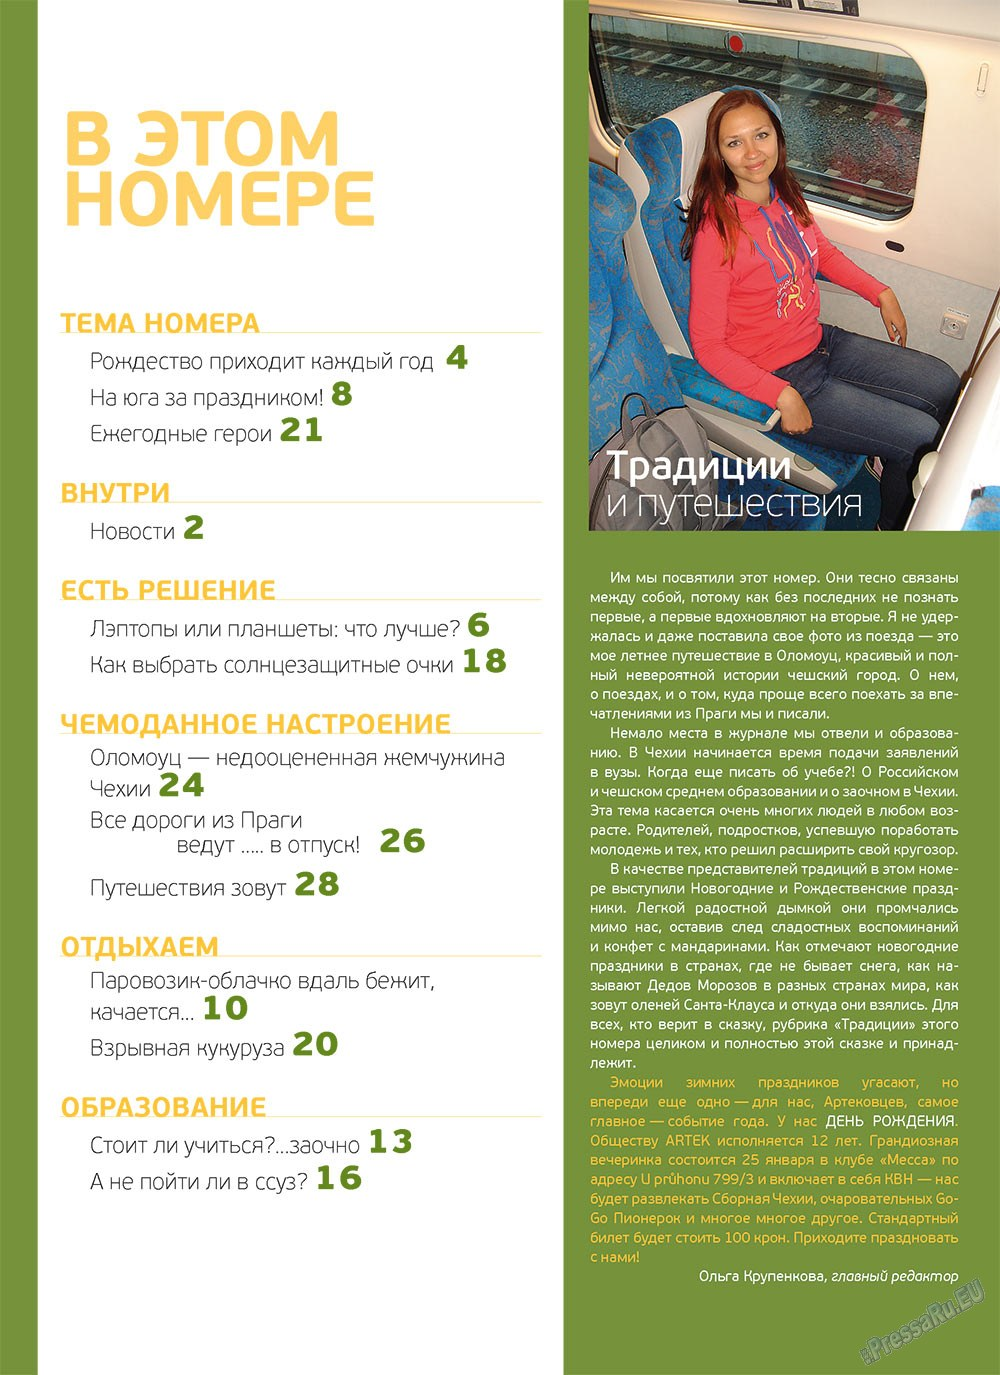 Артек (журнал). 2012 год, номер 6, стр. 3